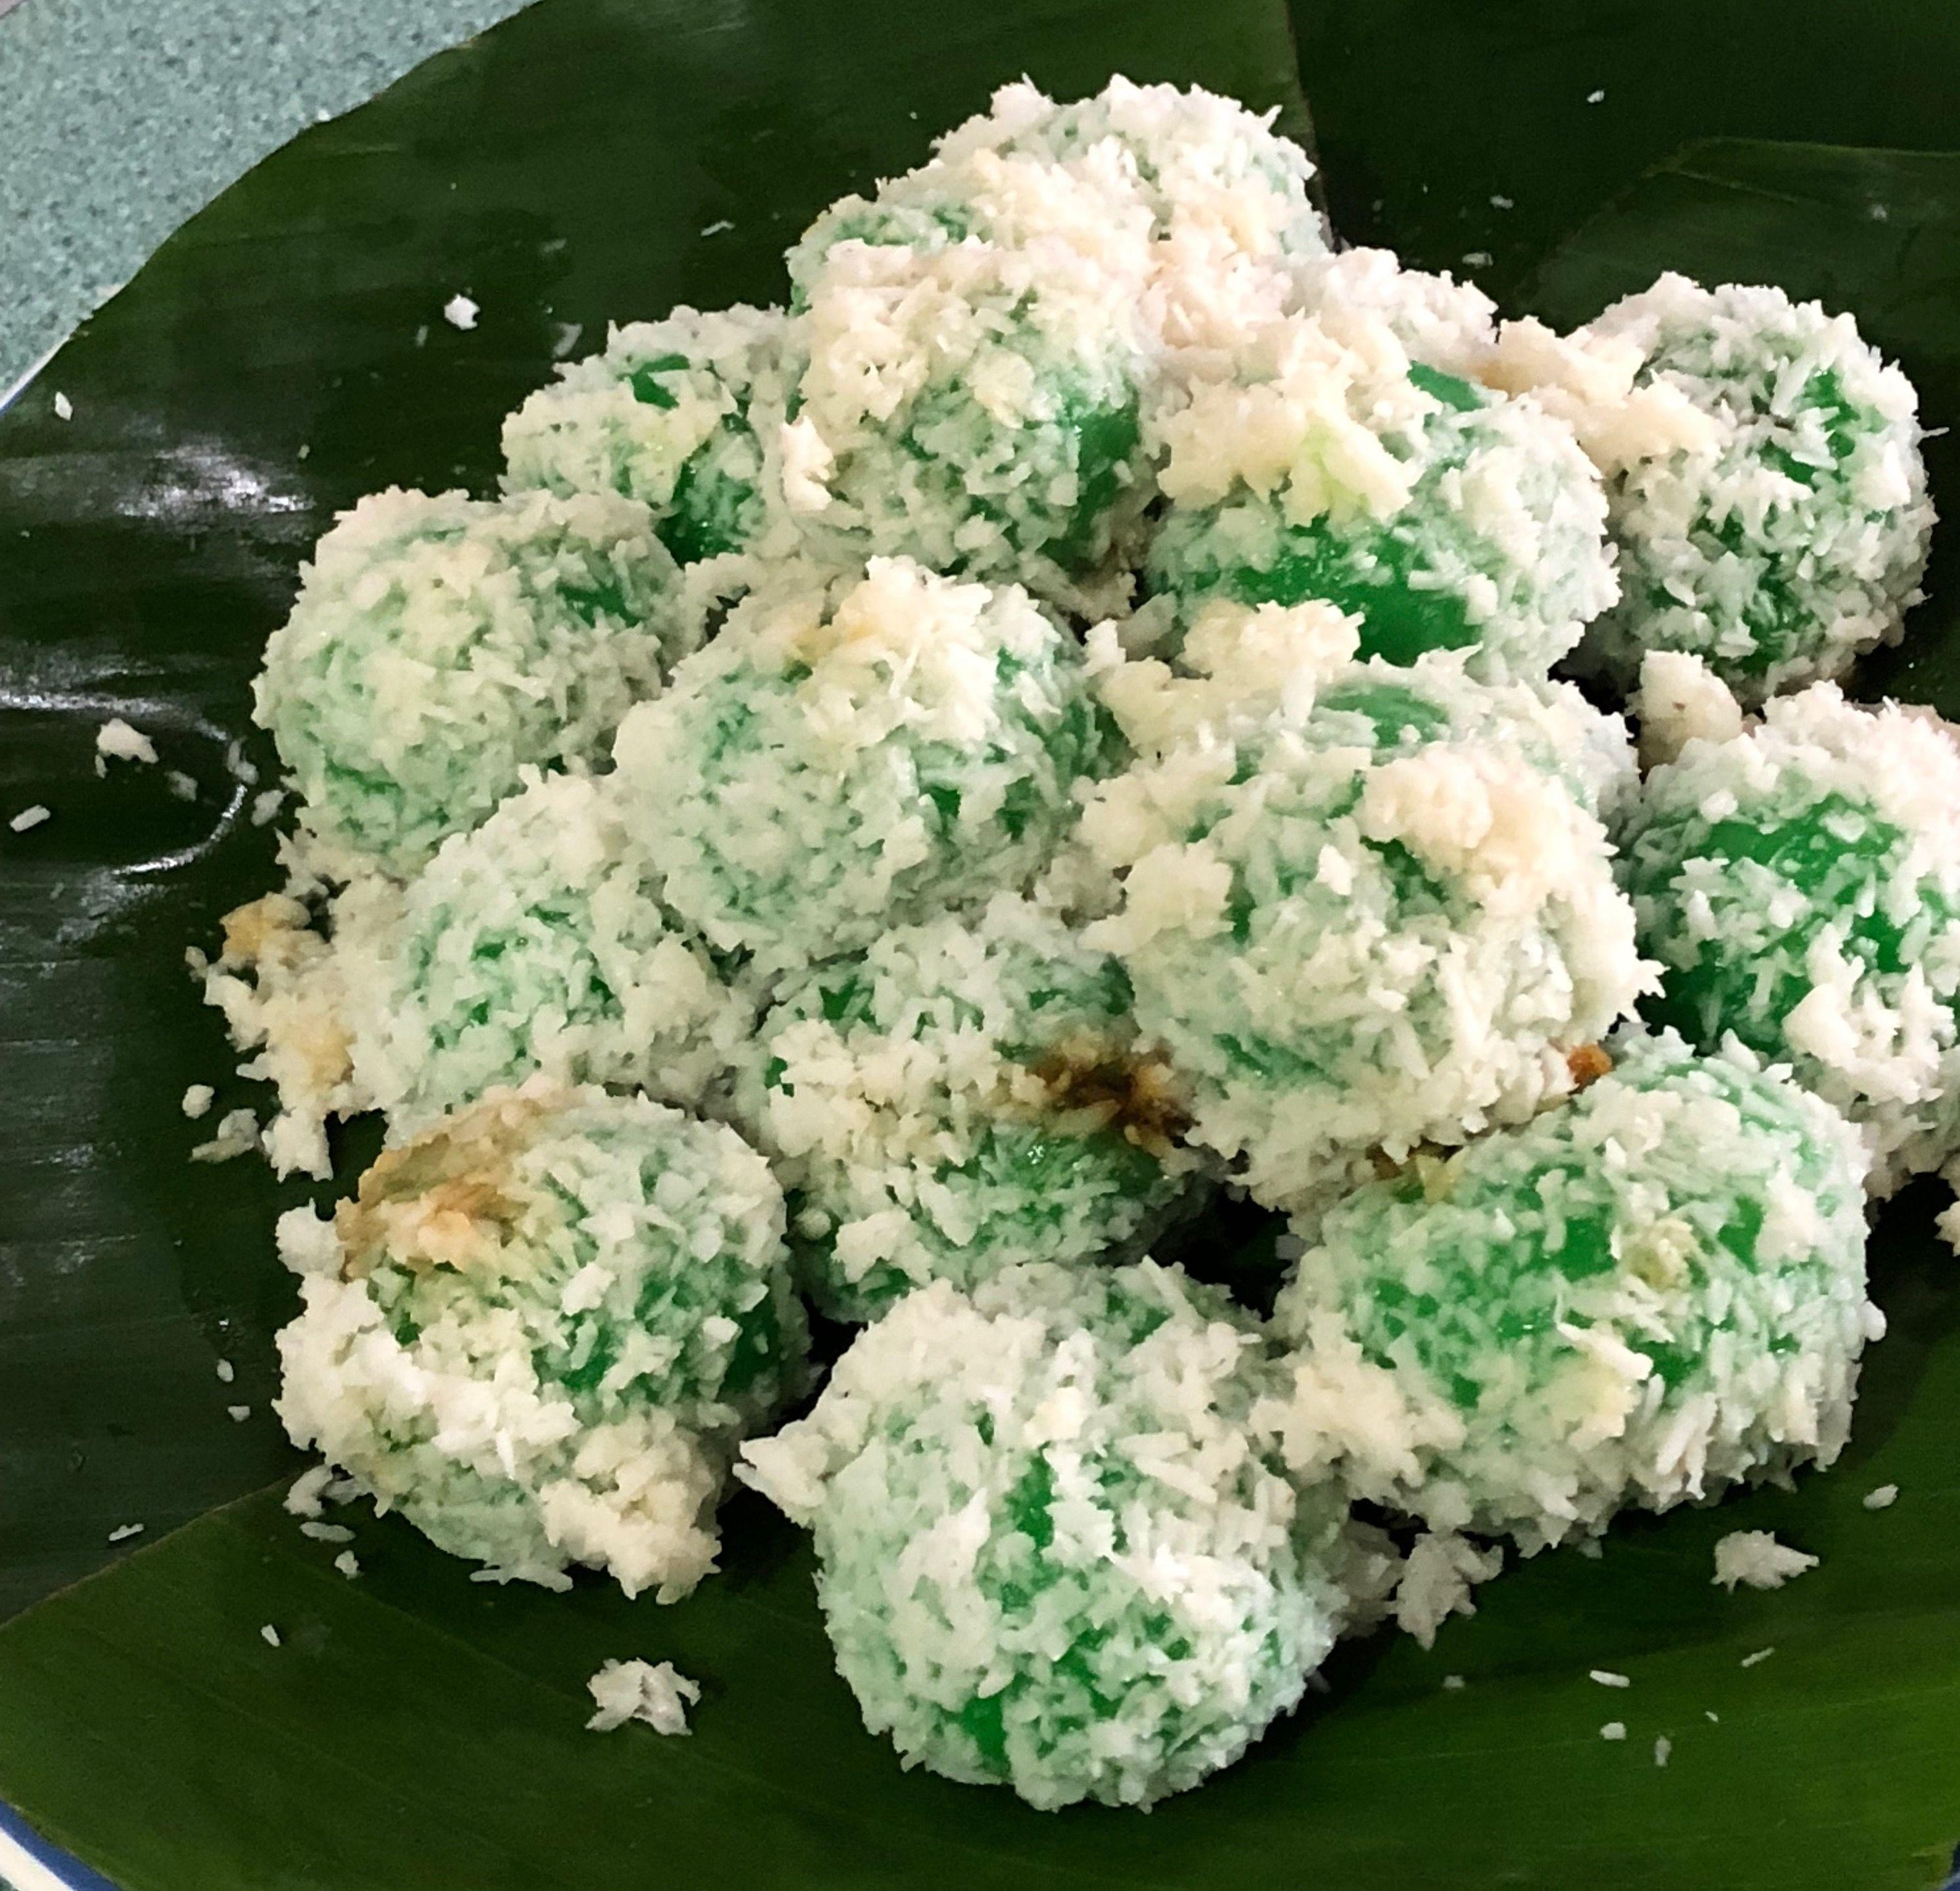 KLEPON glutinous flour balls with melting palm sugar